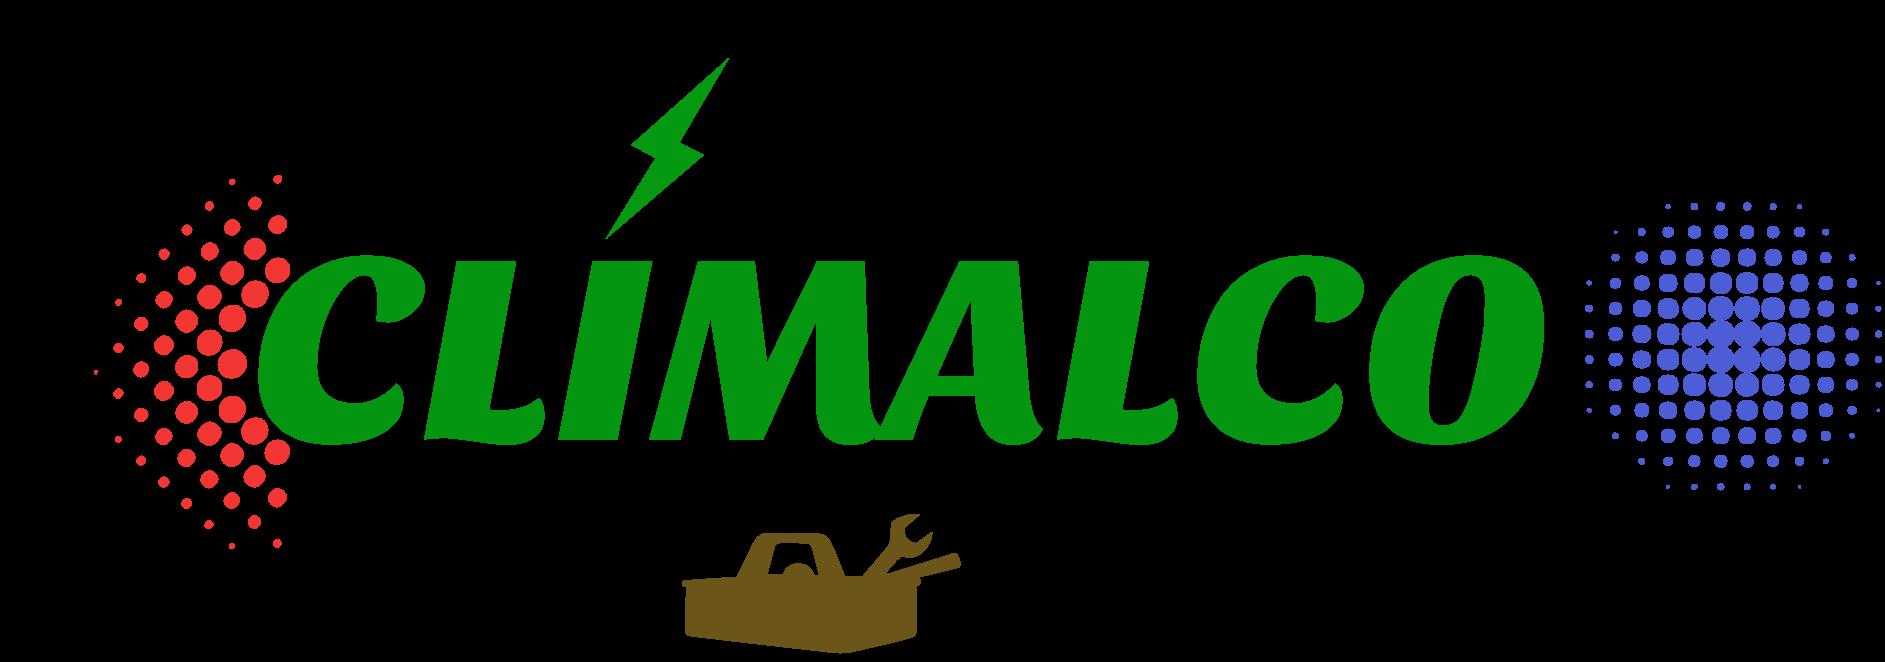 Climalco